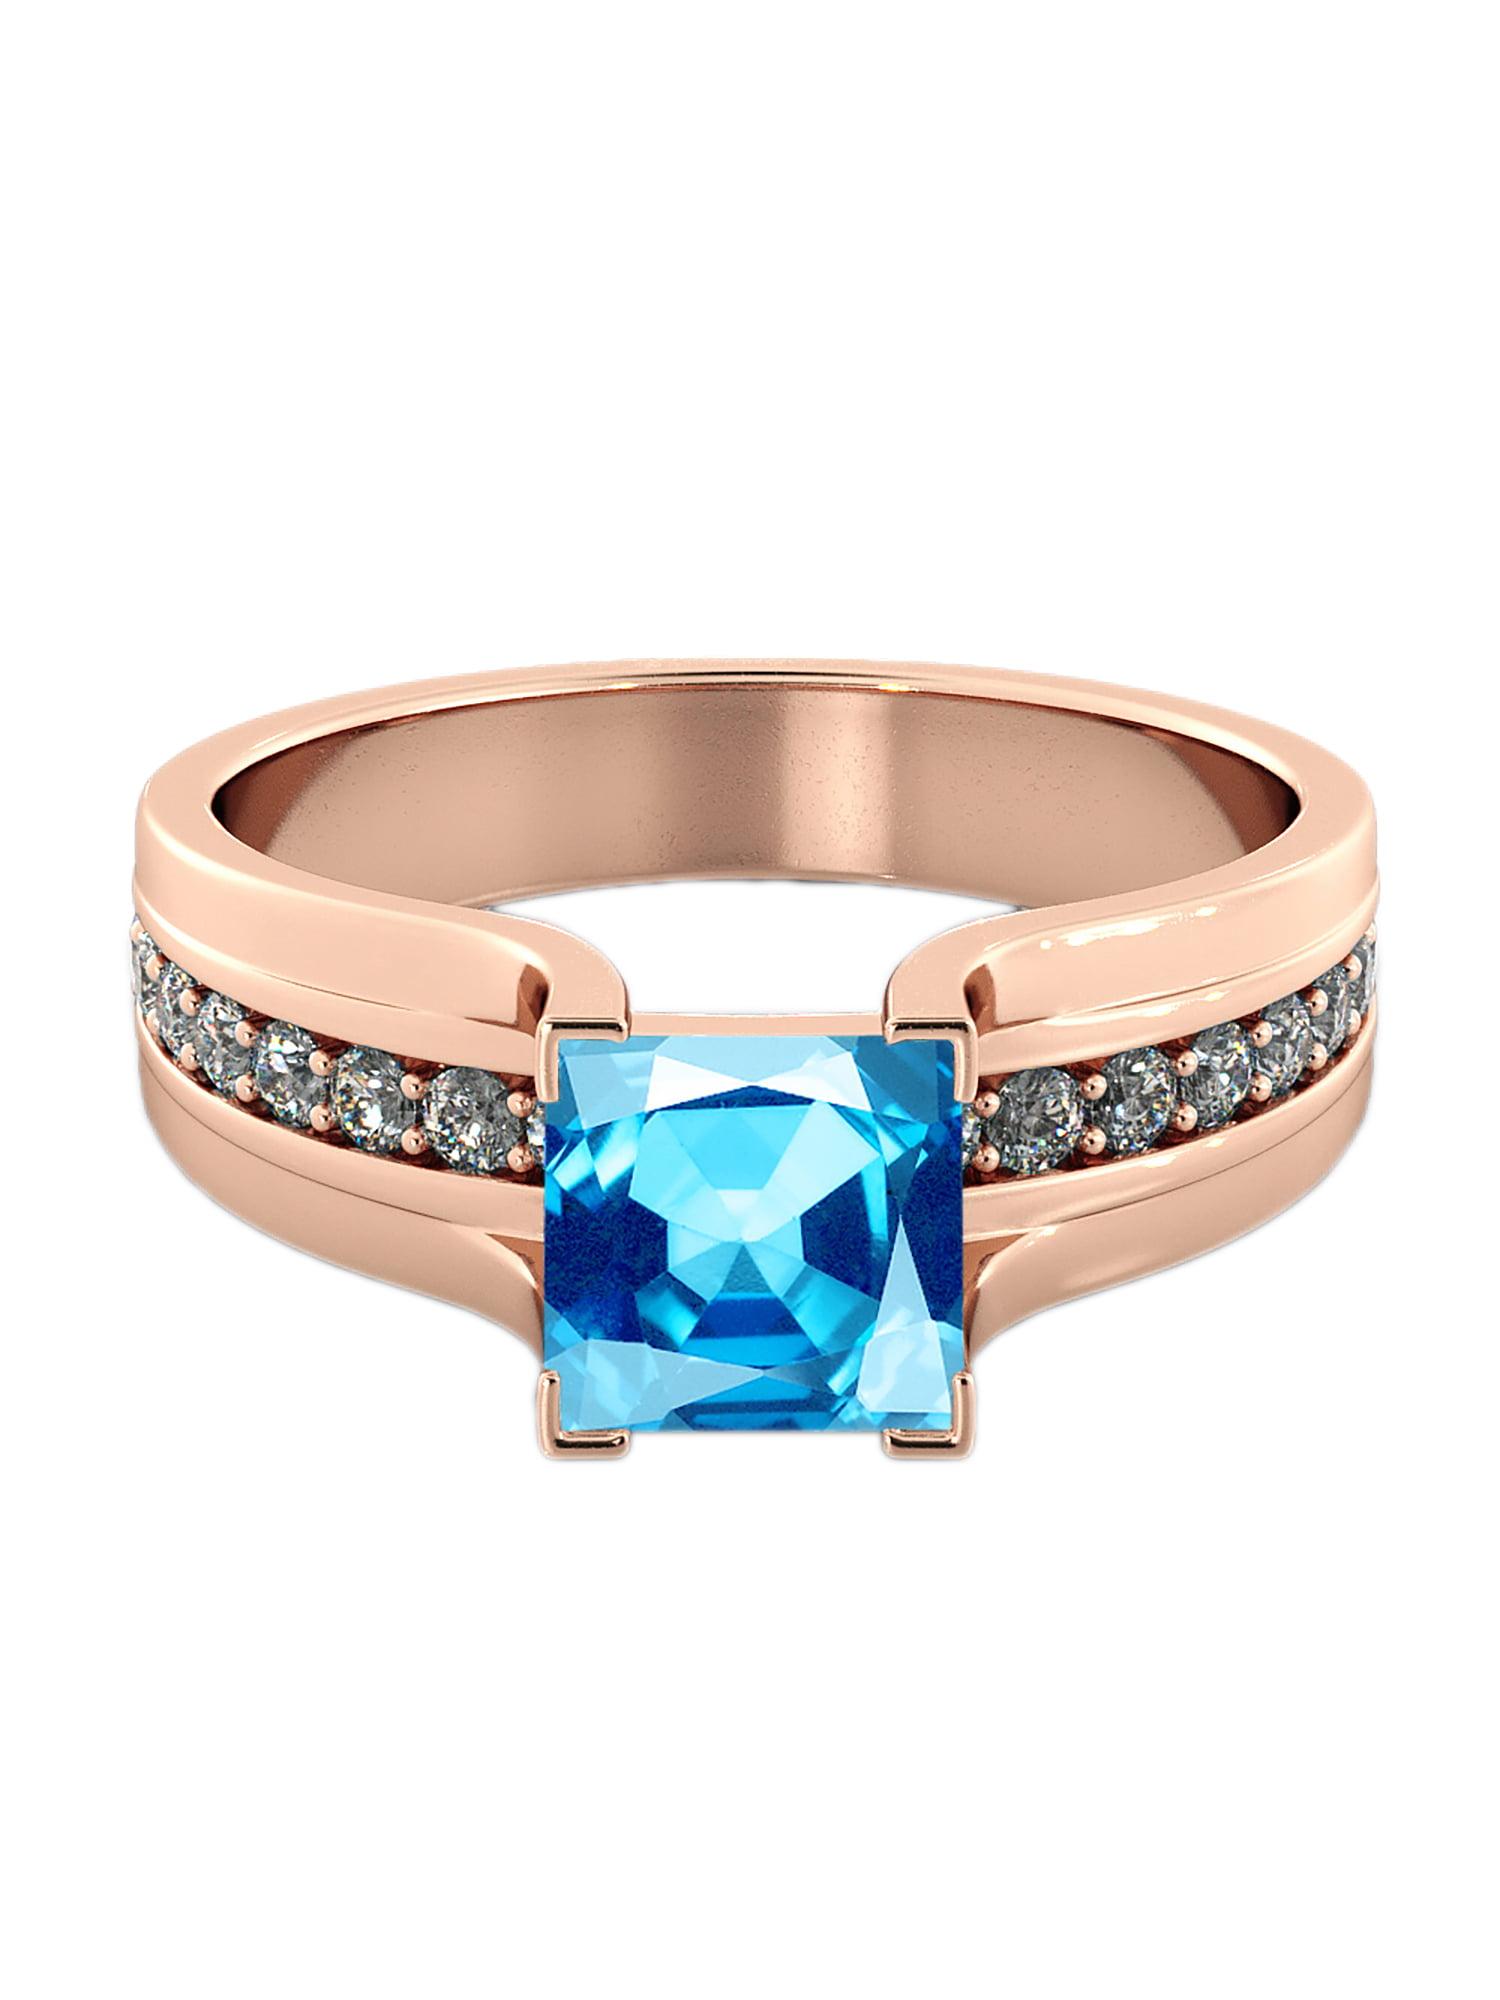 Aquamarine 5.20 ctw Ring with Diamonds 14K Rose Gold Bridge Channel set Princess by Diamonds Mine